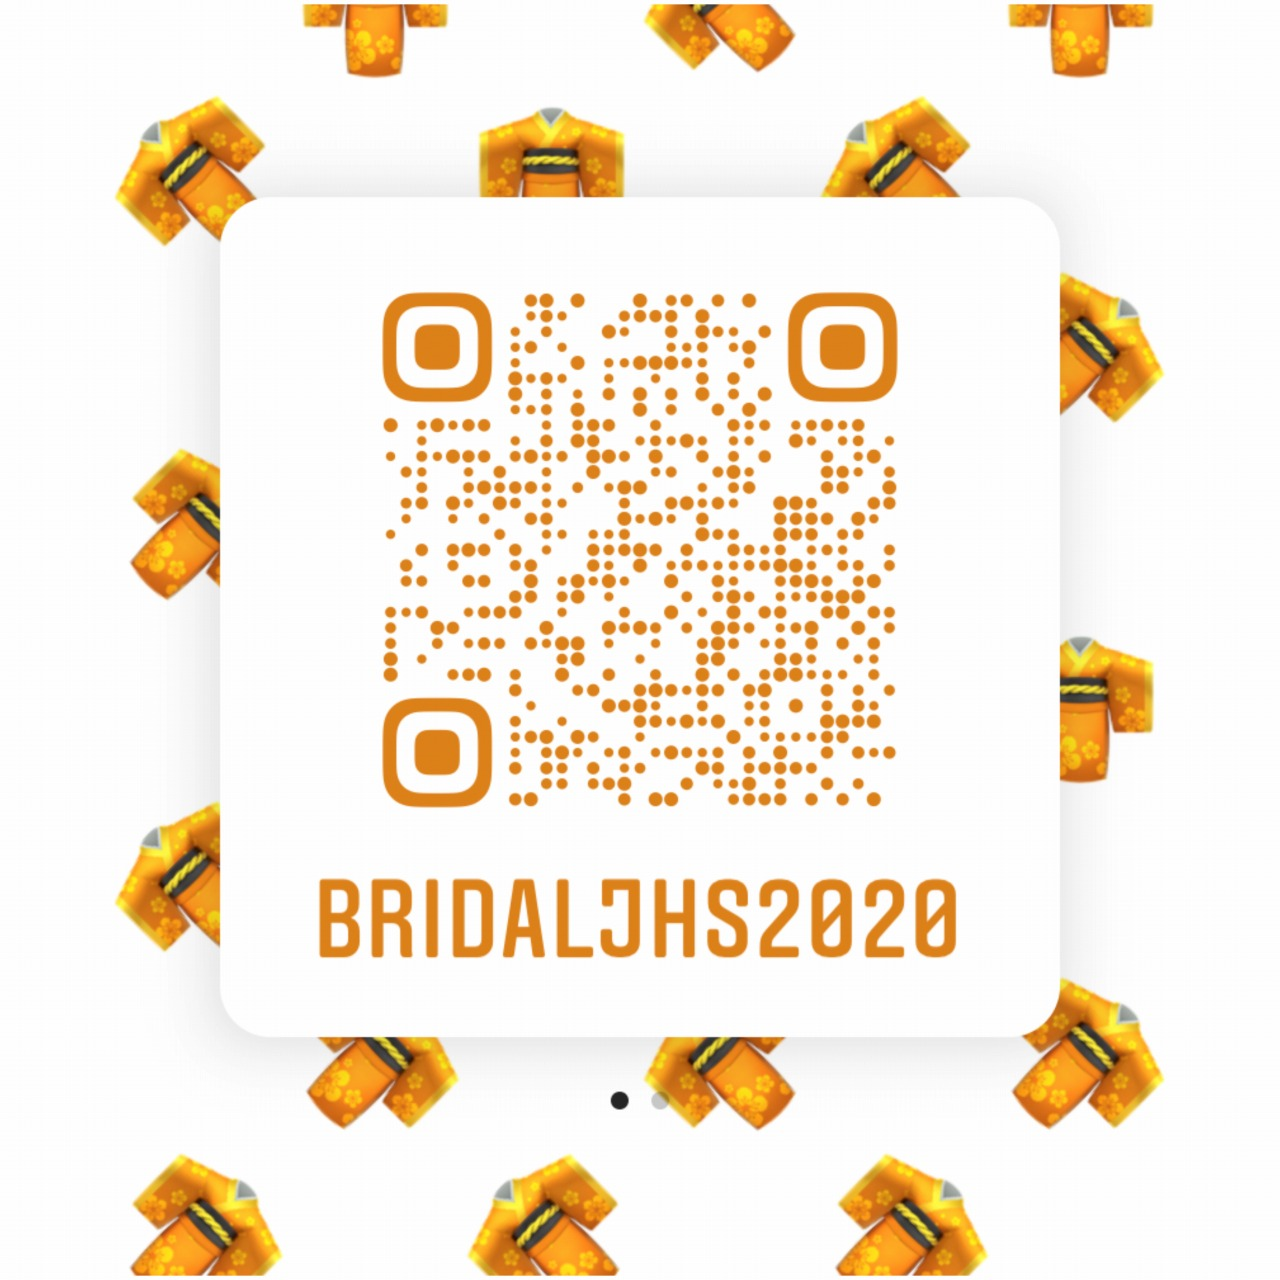 Instagram「卒業袴展示会2020専用アカウント」を開設しました!Check it out!!